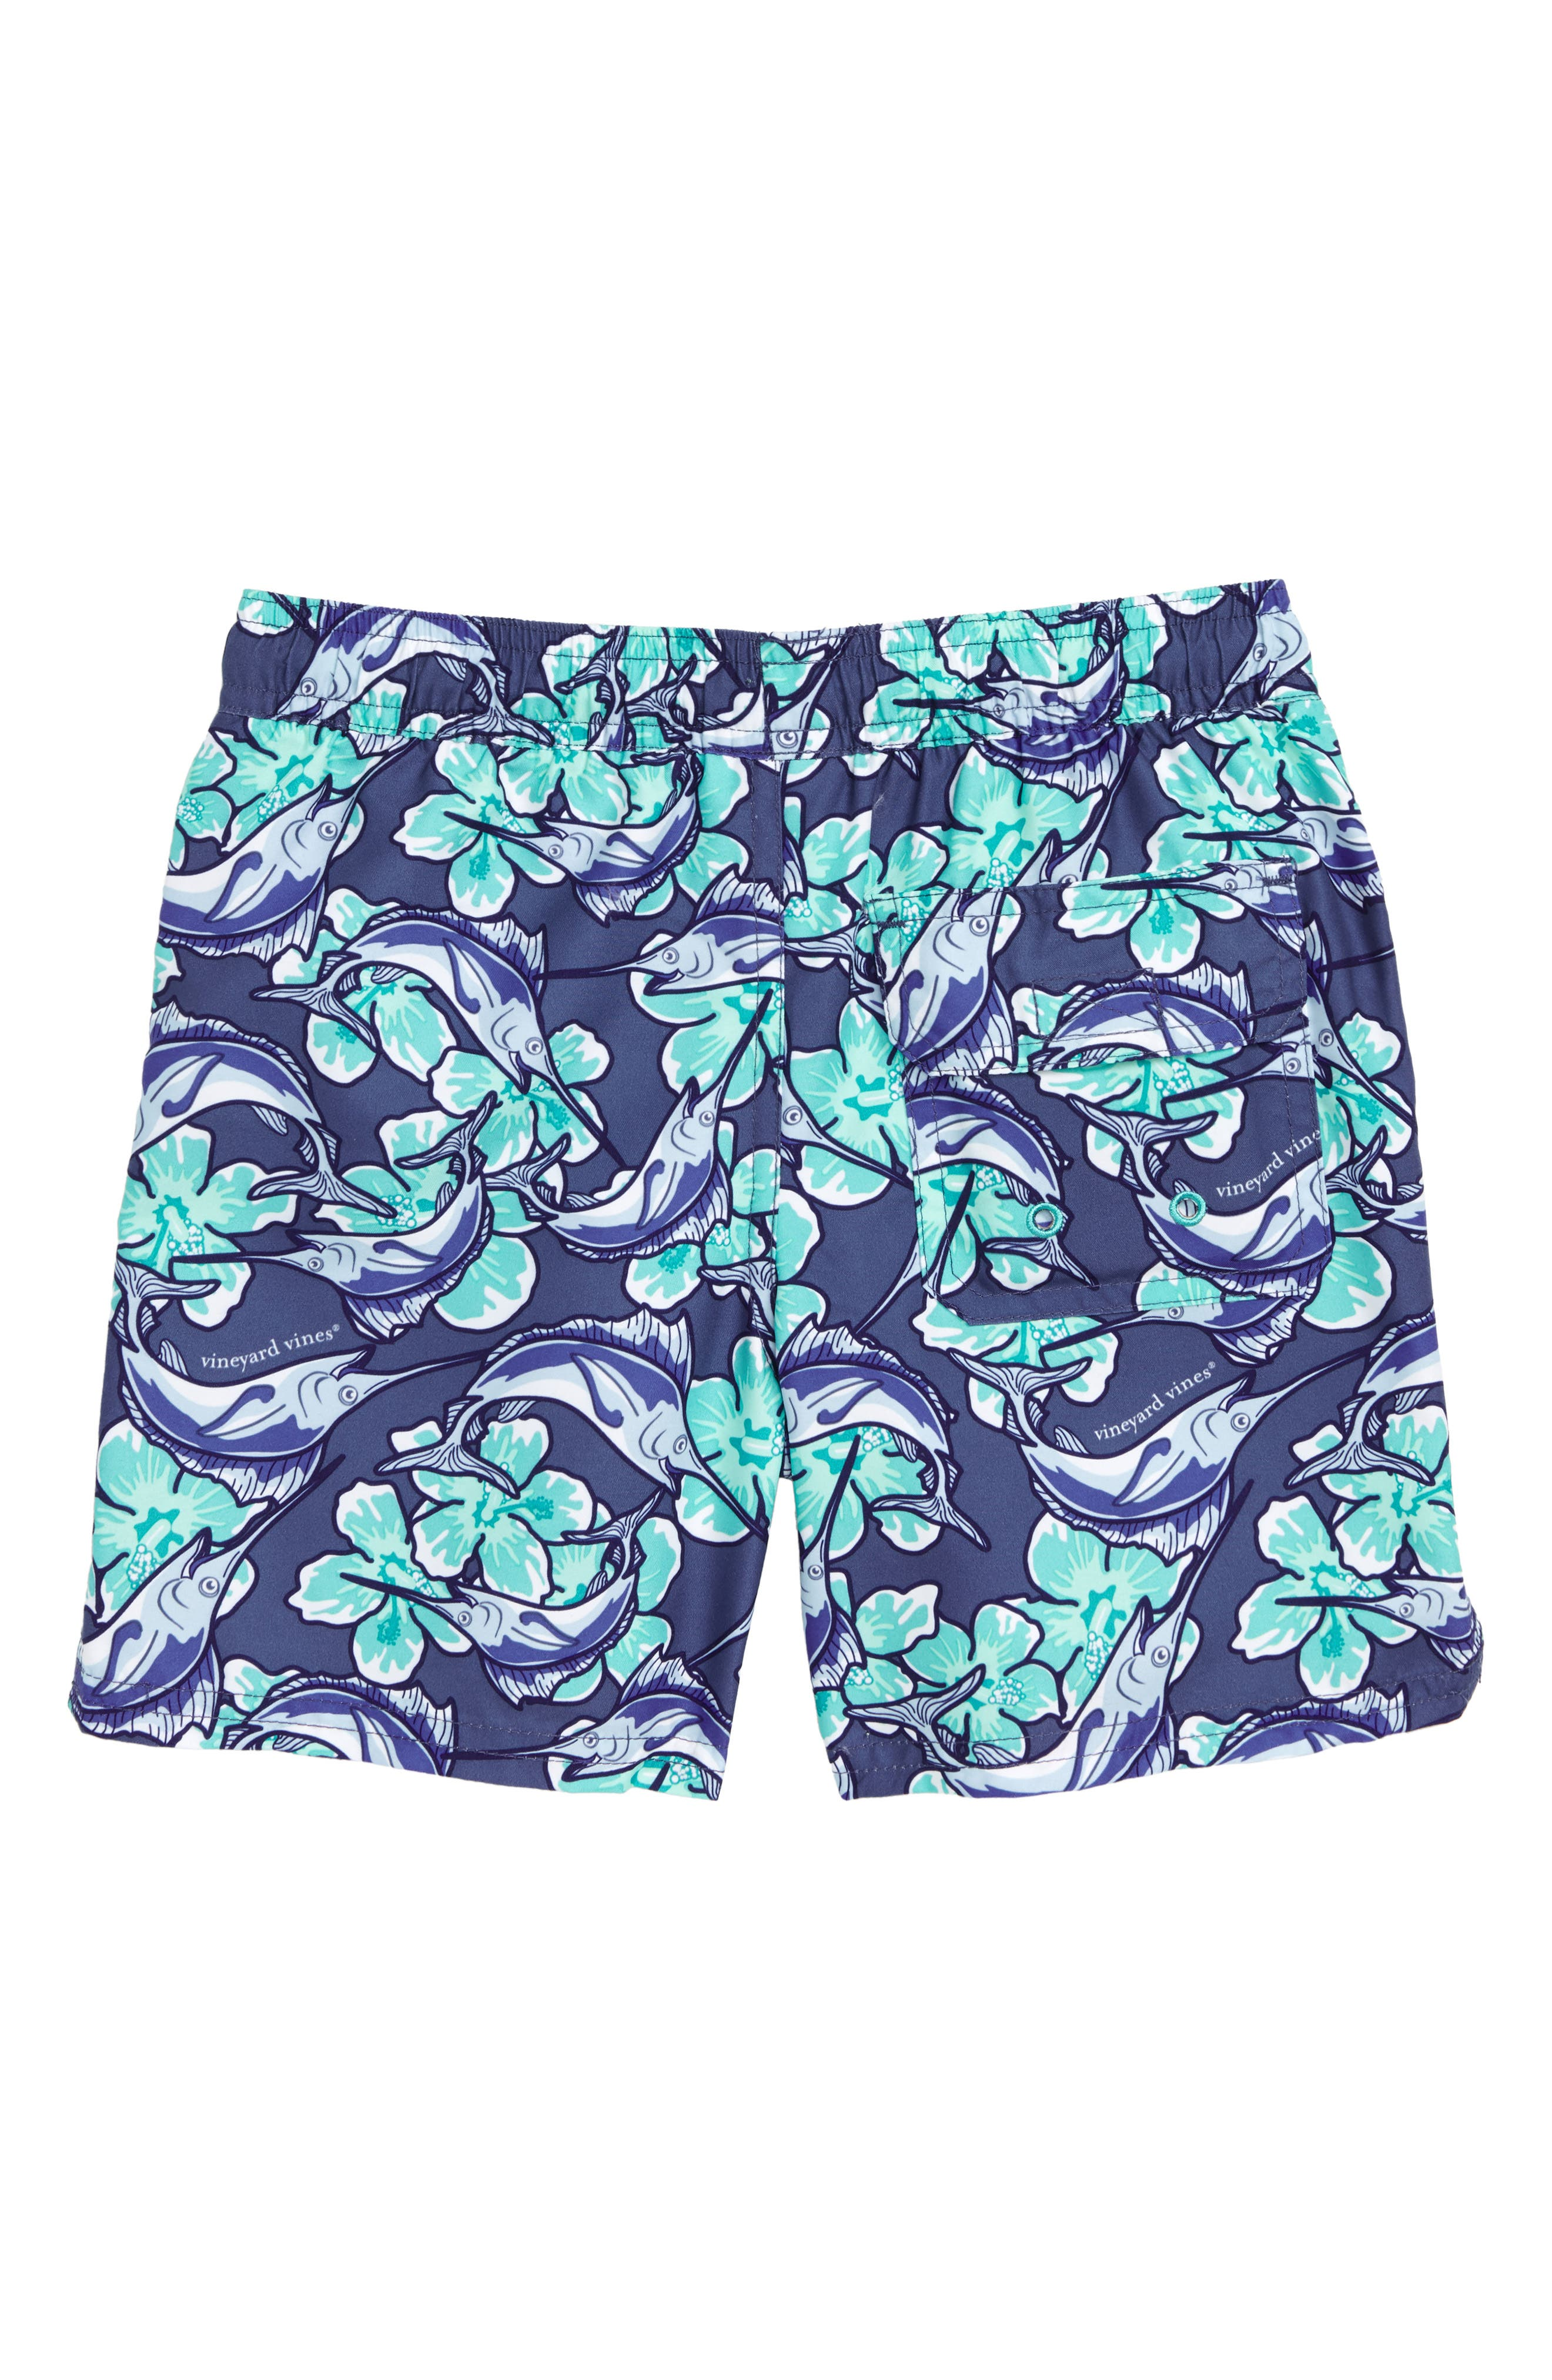 Chappy Marlin Flower Swim Trunks,                             Alternate thumbnail 2, color,                             461